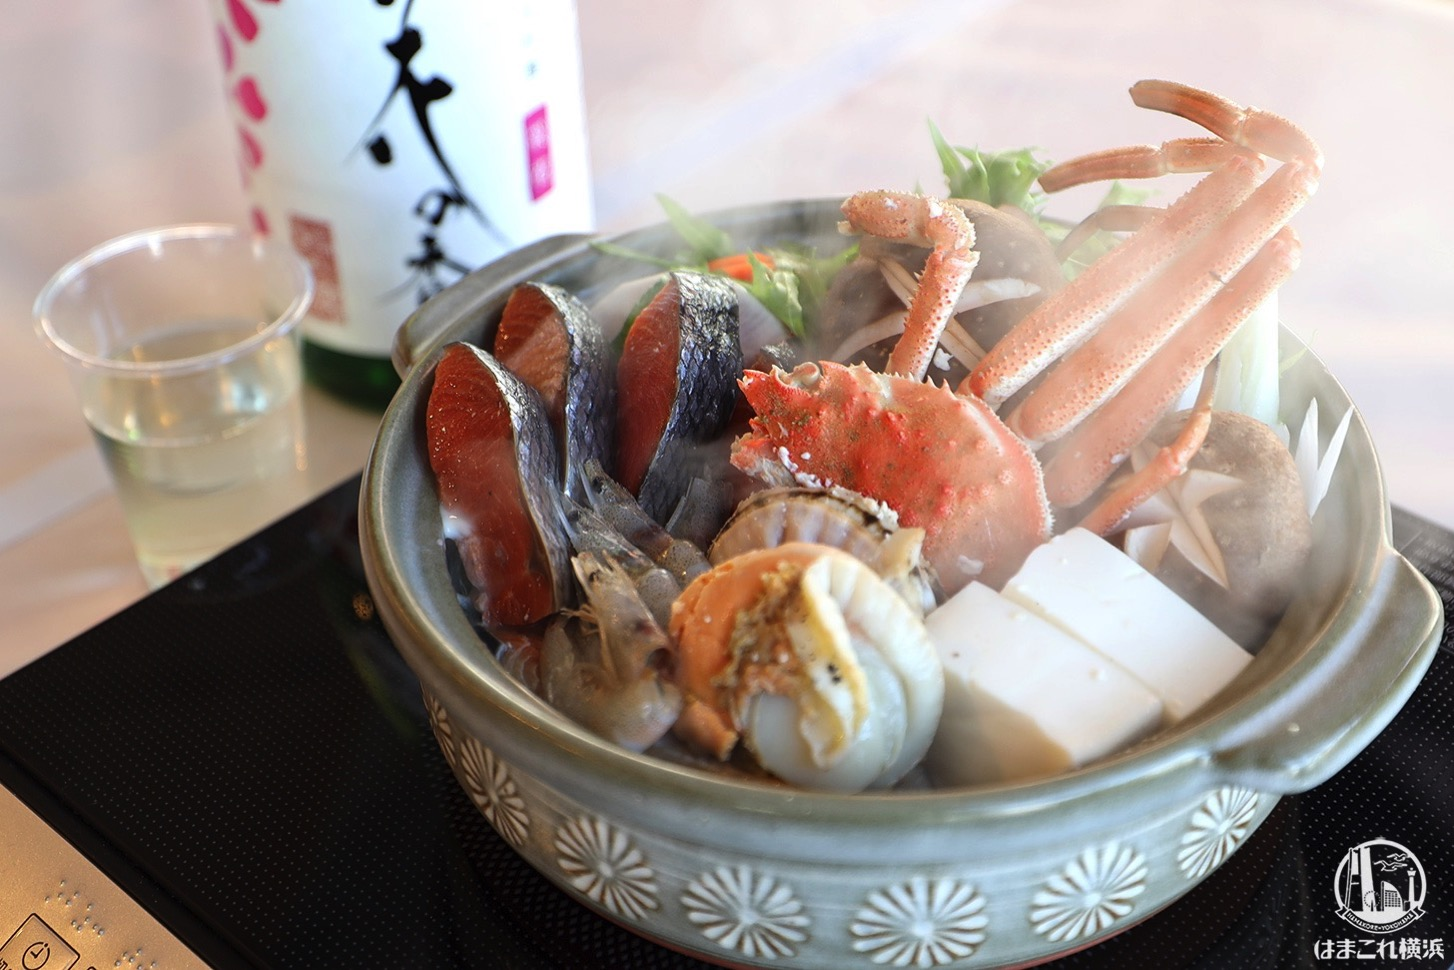 石狩鍋と花の香 純米大吟醸 桜花